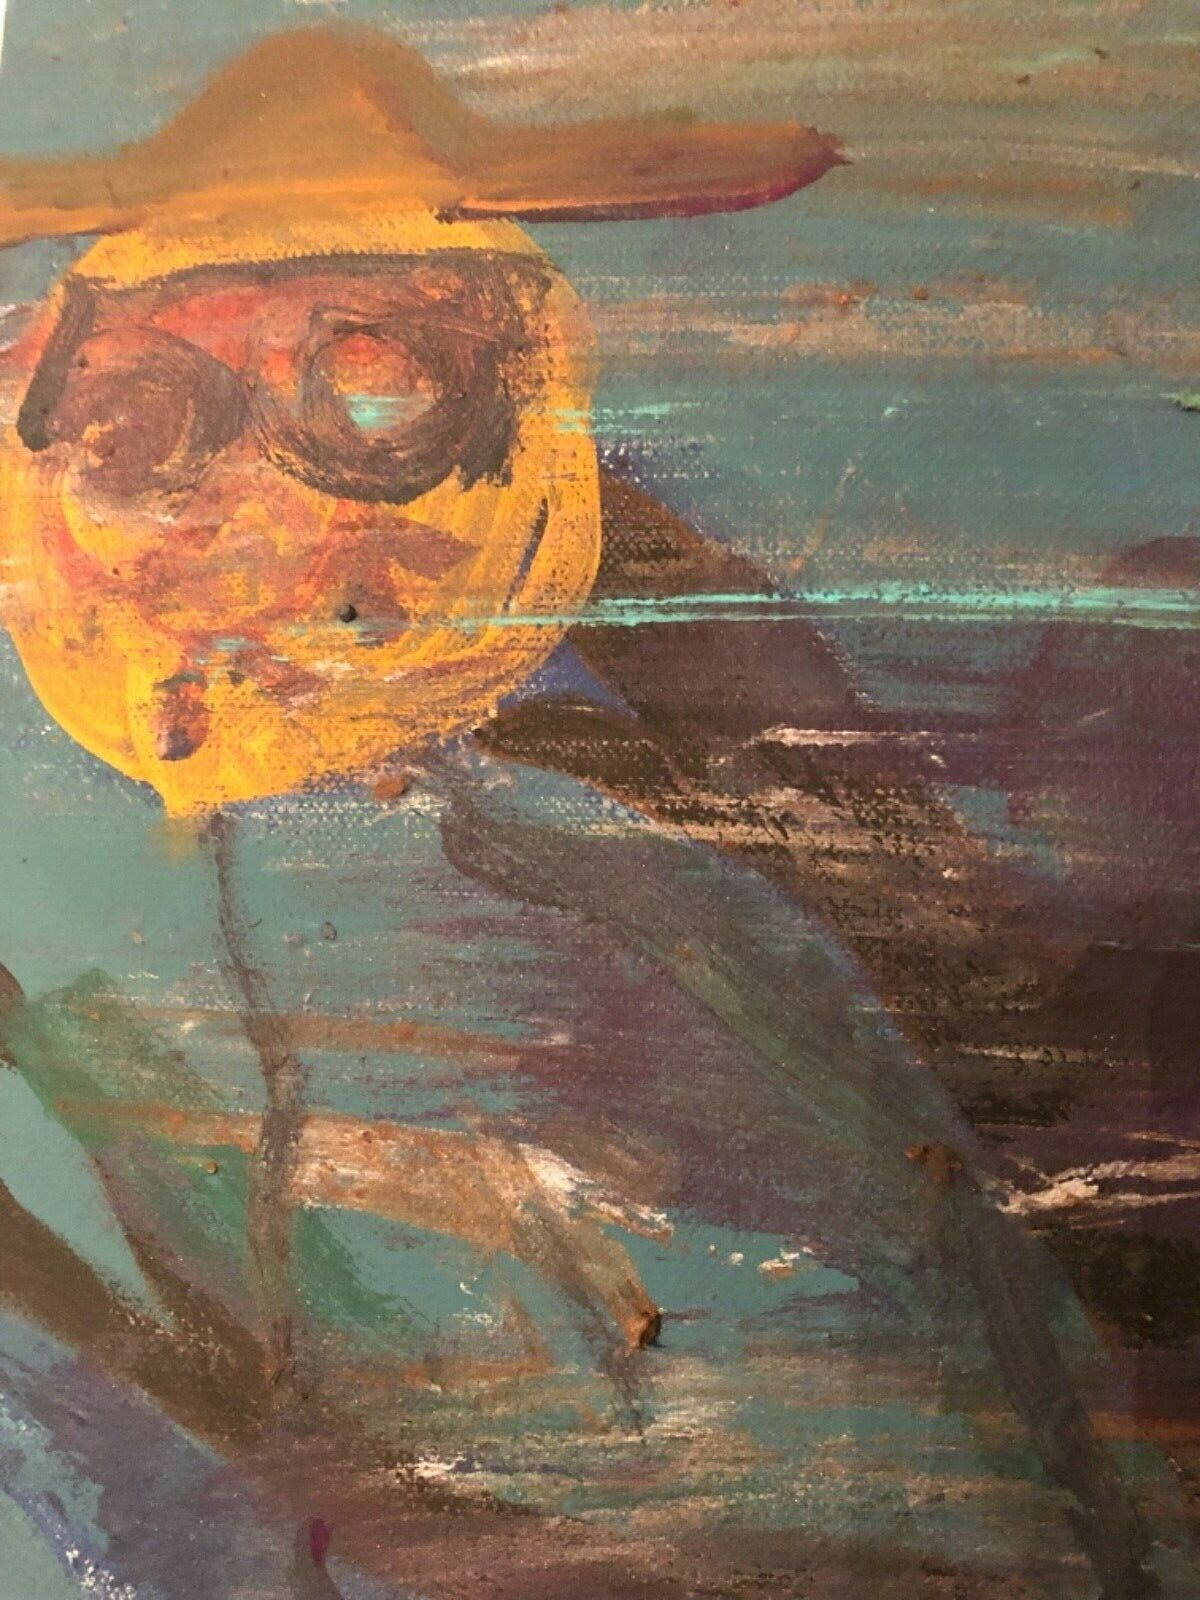 Paul Parris Outsider Art Expressionist Picasso Dali Graffiti Miro Chagall Keil - $59.00